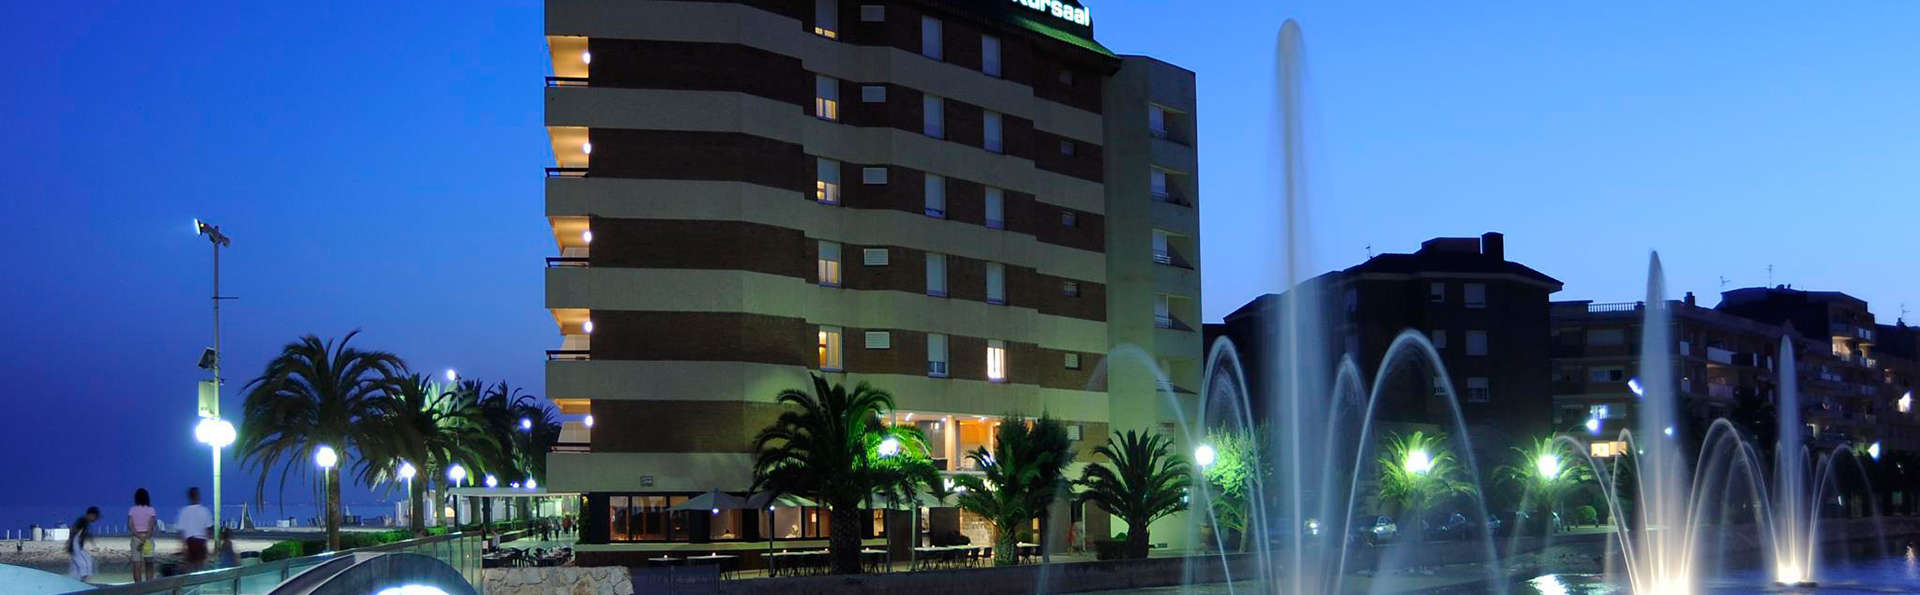 Hotel Kursaal Calafell - edit_front.jpg